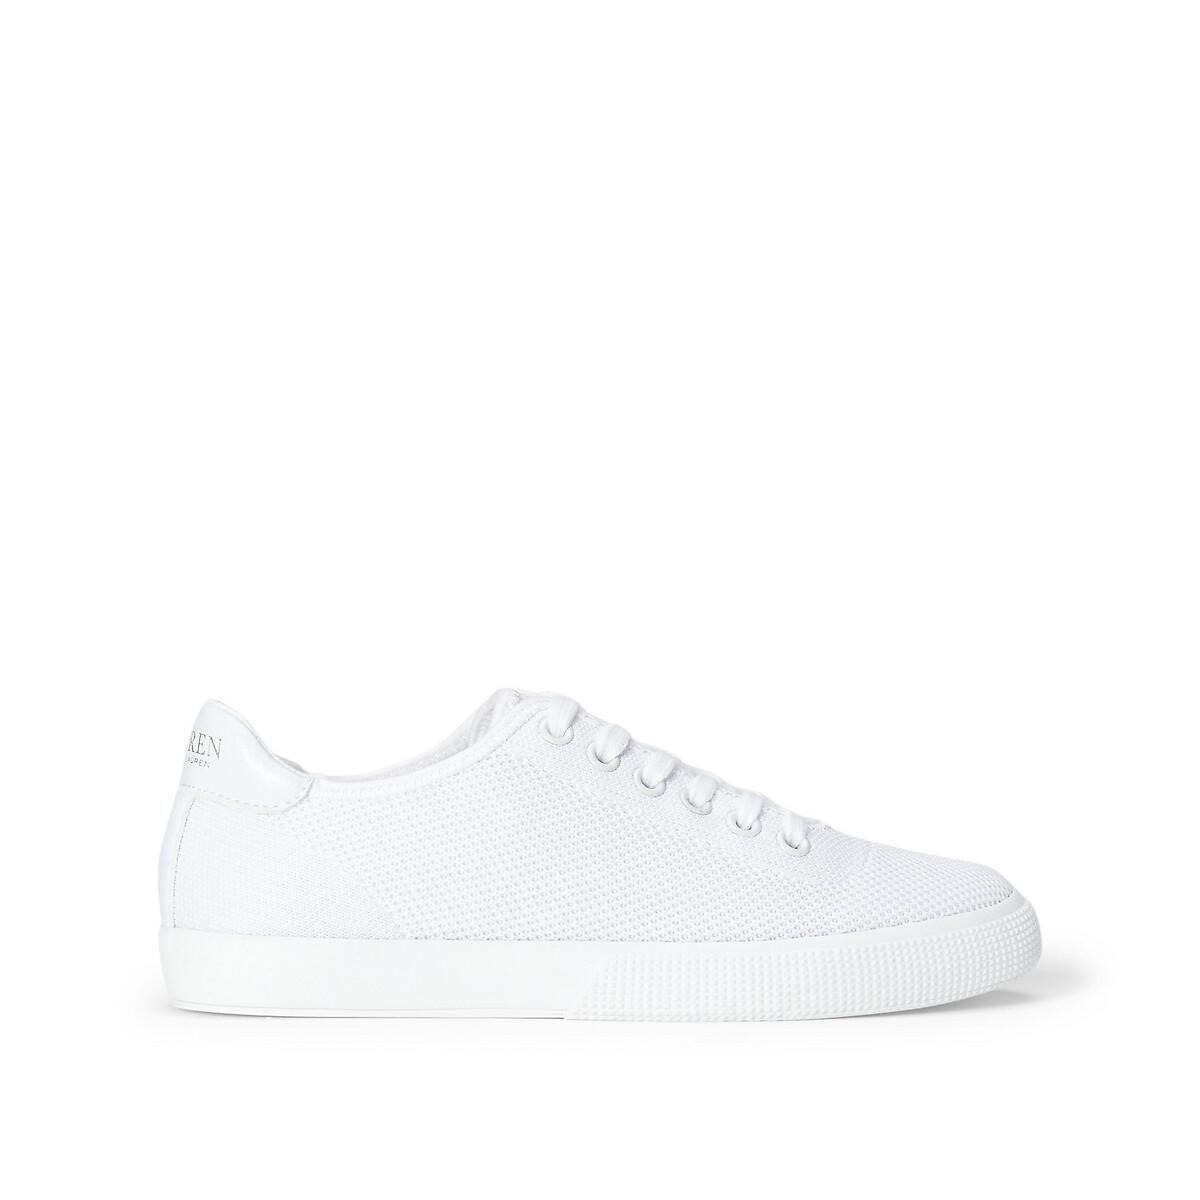 Кеды LaRedoute Тканевые на шнуровке 36 белый кеды laredoute высокие тканевые на шнуровке 39 белый